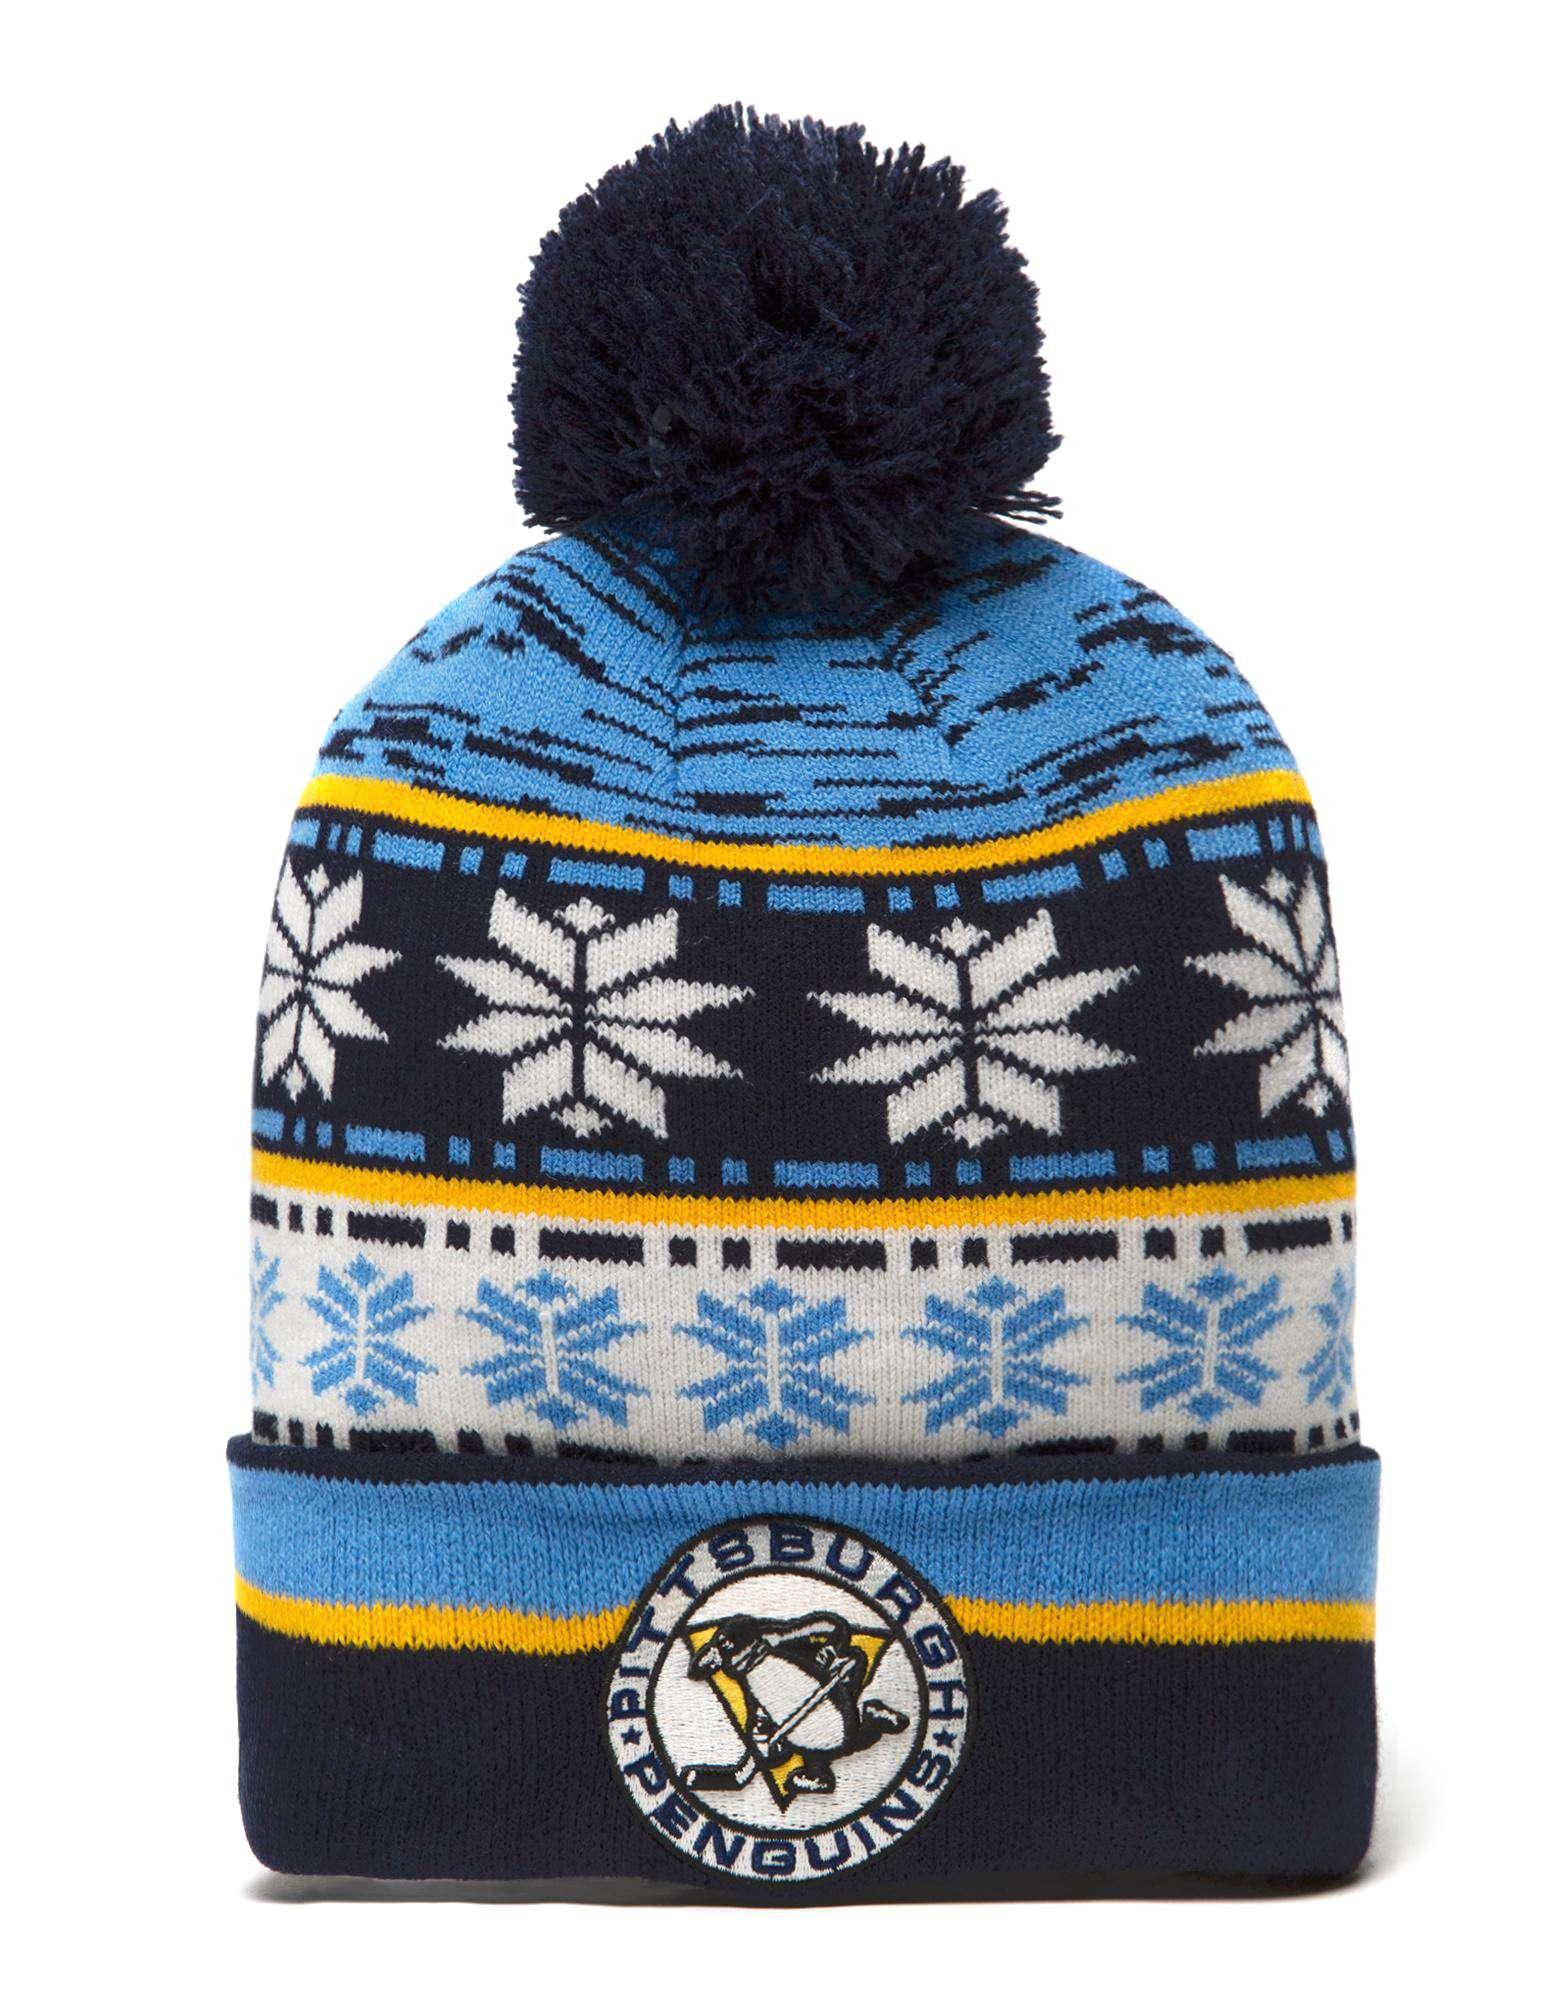 New Era NHL Pittsburgh Penguins Blizzard Bobble Hat